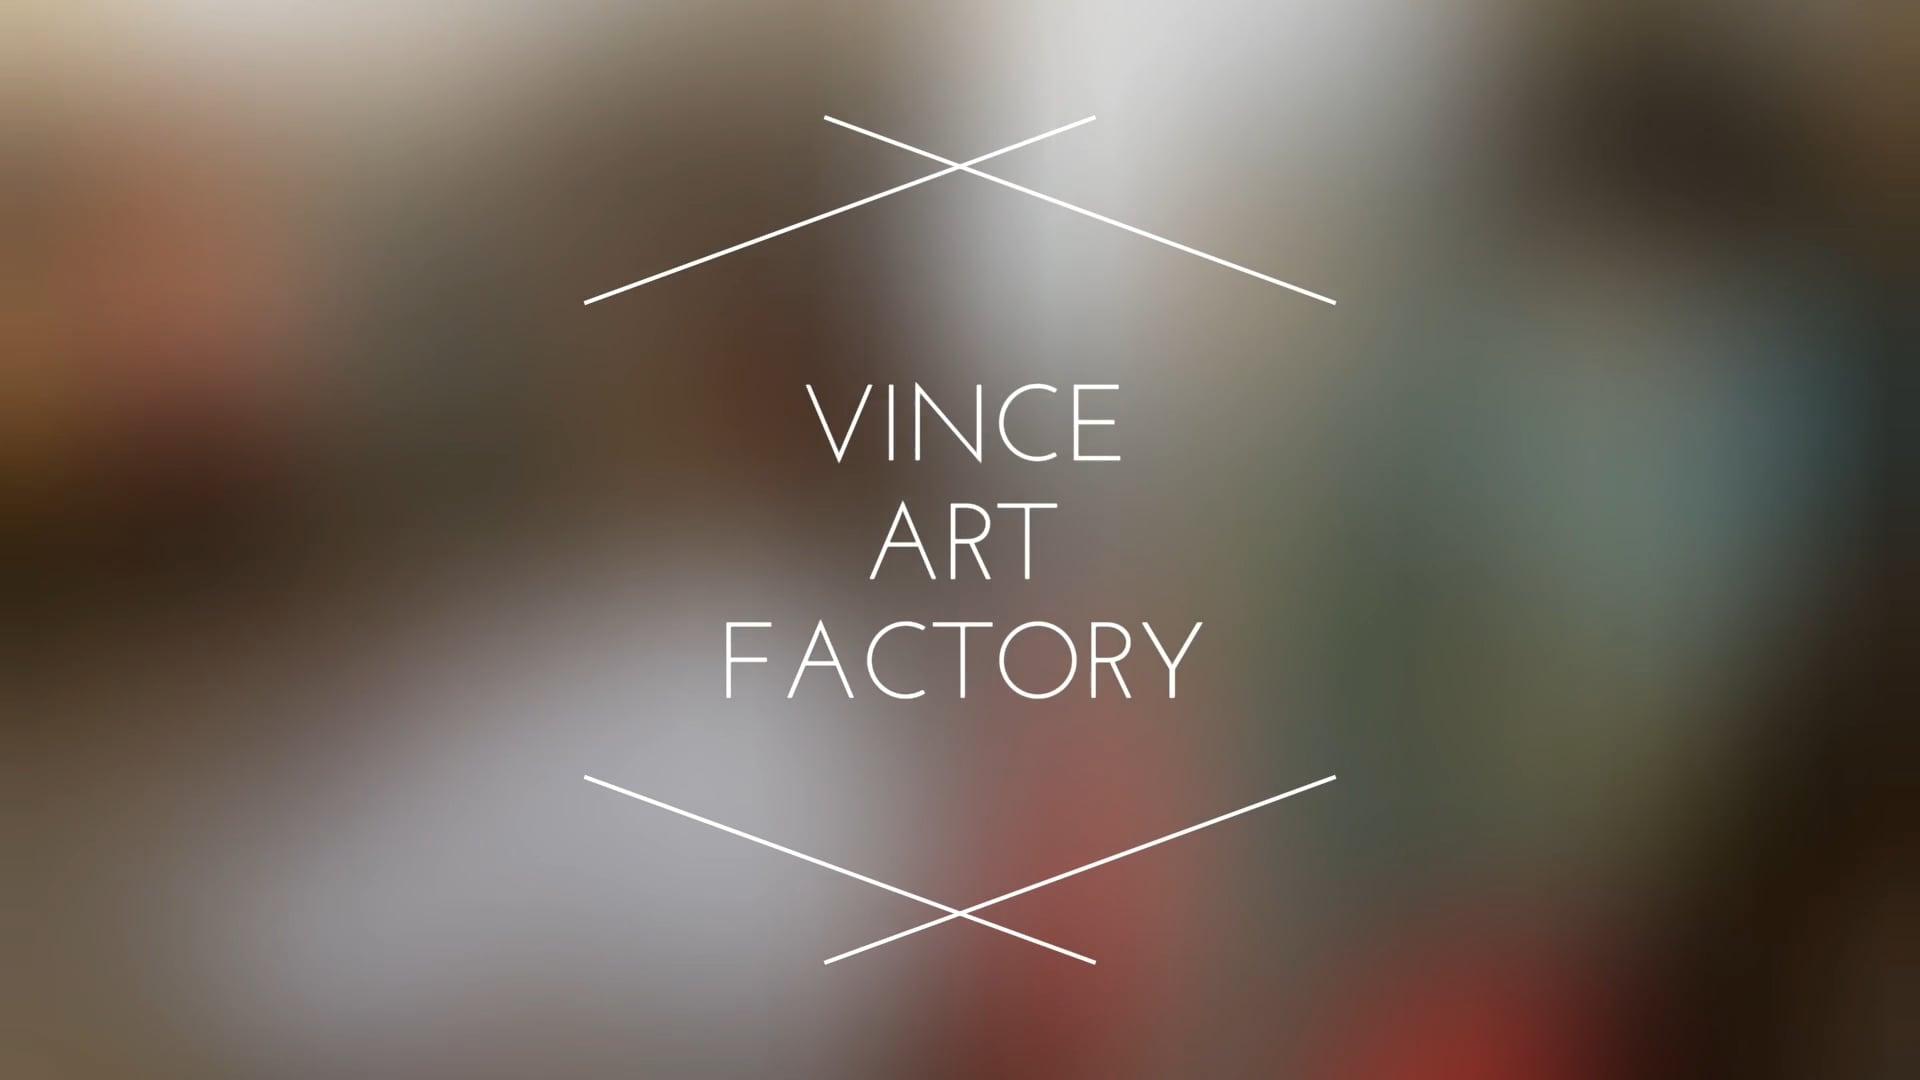 VINCE ART FACTORY